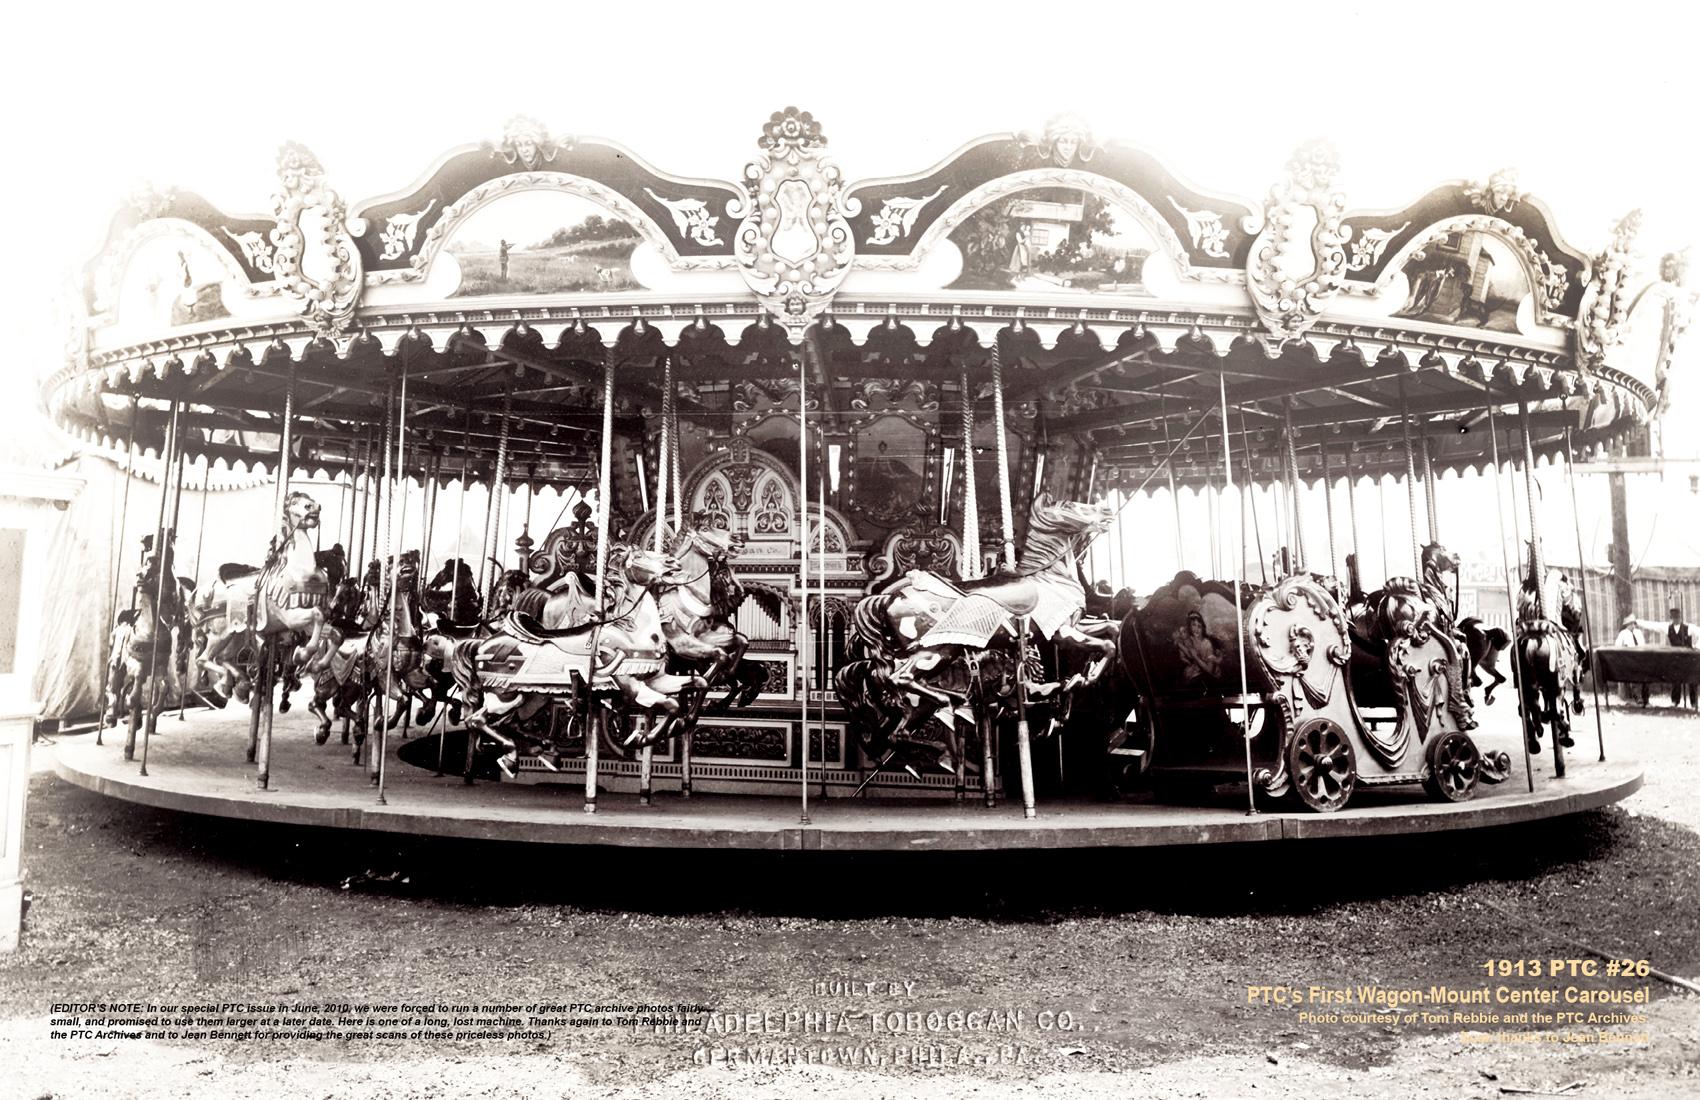 1912-PTC-26-Wagon-Mount-carousel-lost-CNT-center-Feb-13